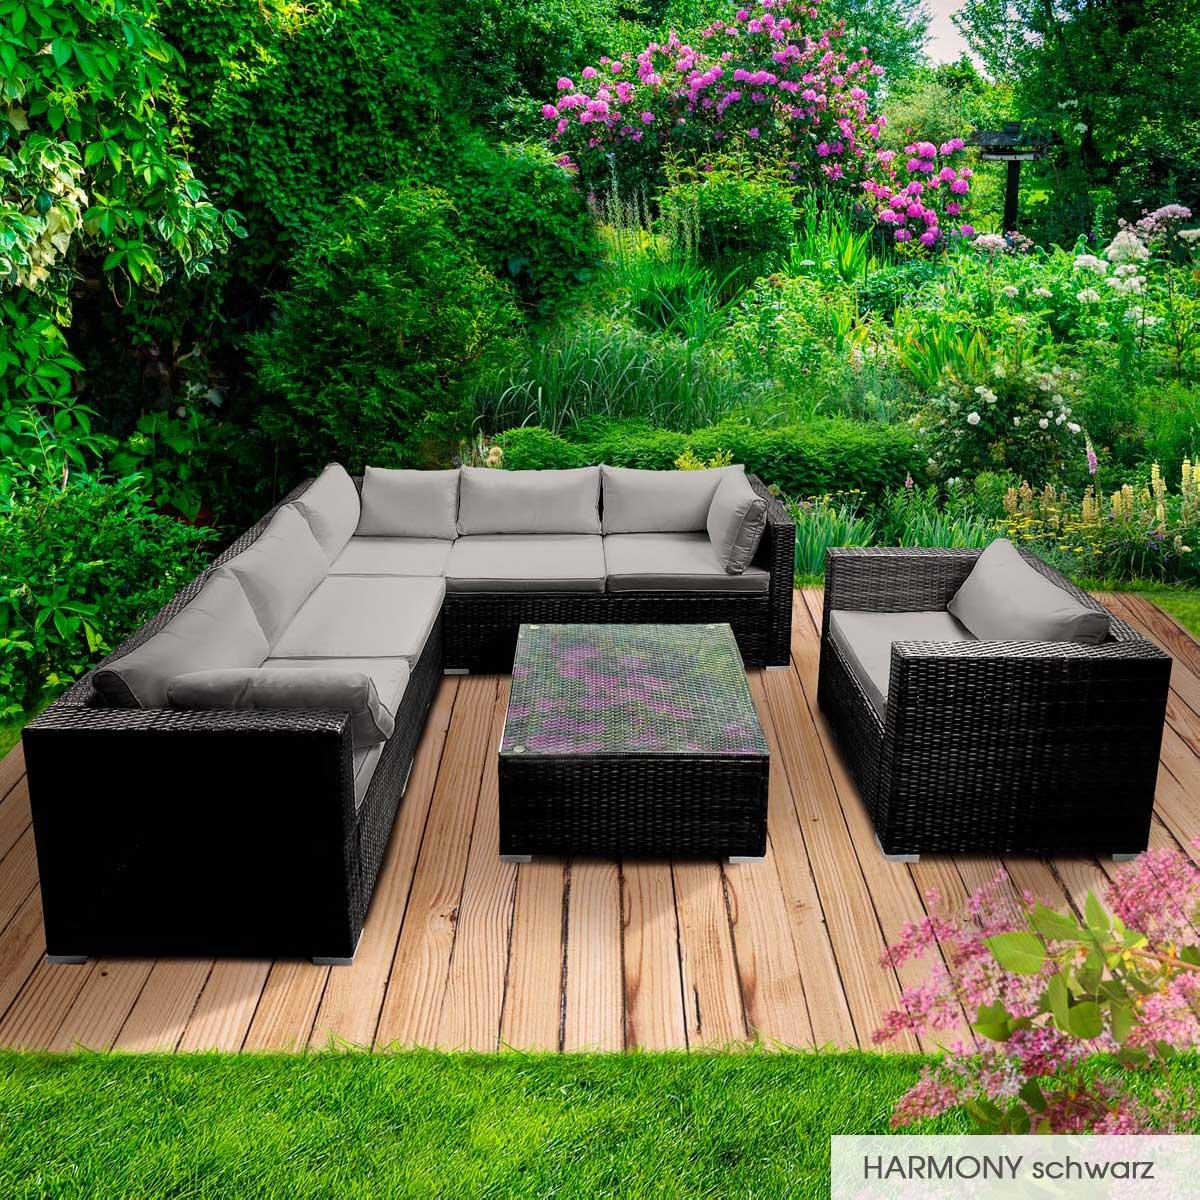 Gartenmoebel-Poly-Rattan-Lounge-Moebel-Sitzgarnitur-Gartengarnitur-Sitzgruppe-Sofa Indexbild 68